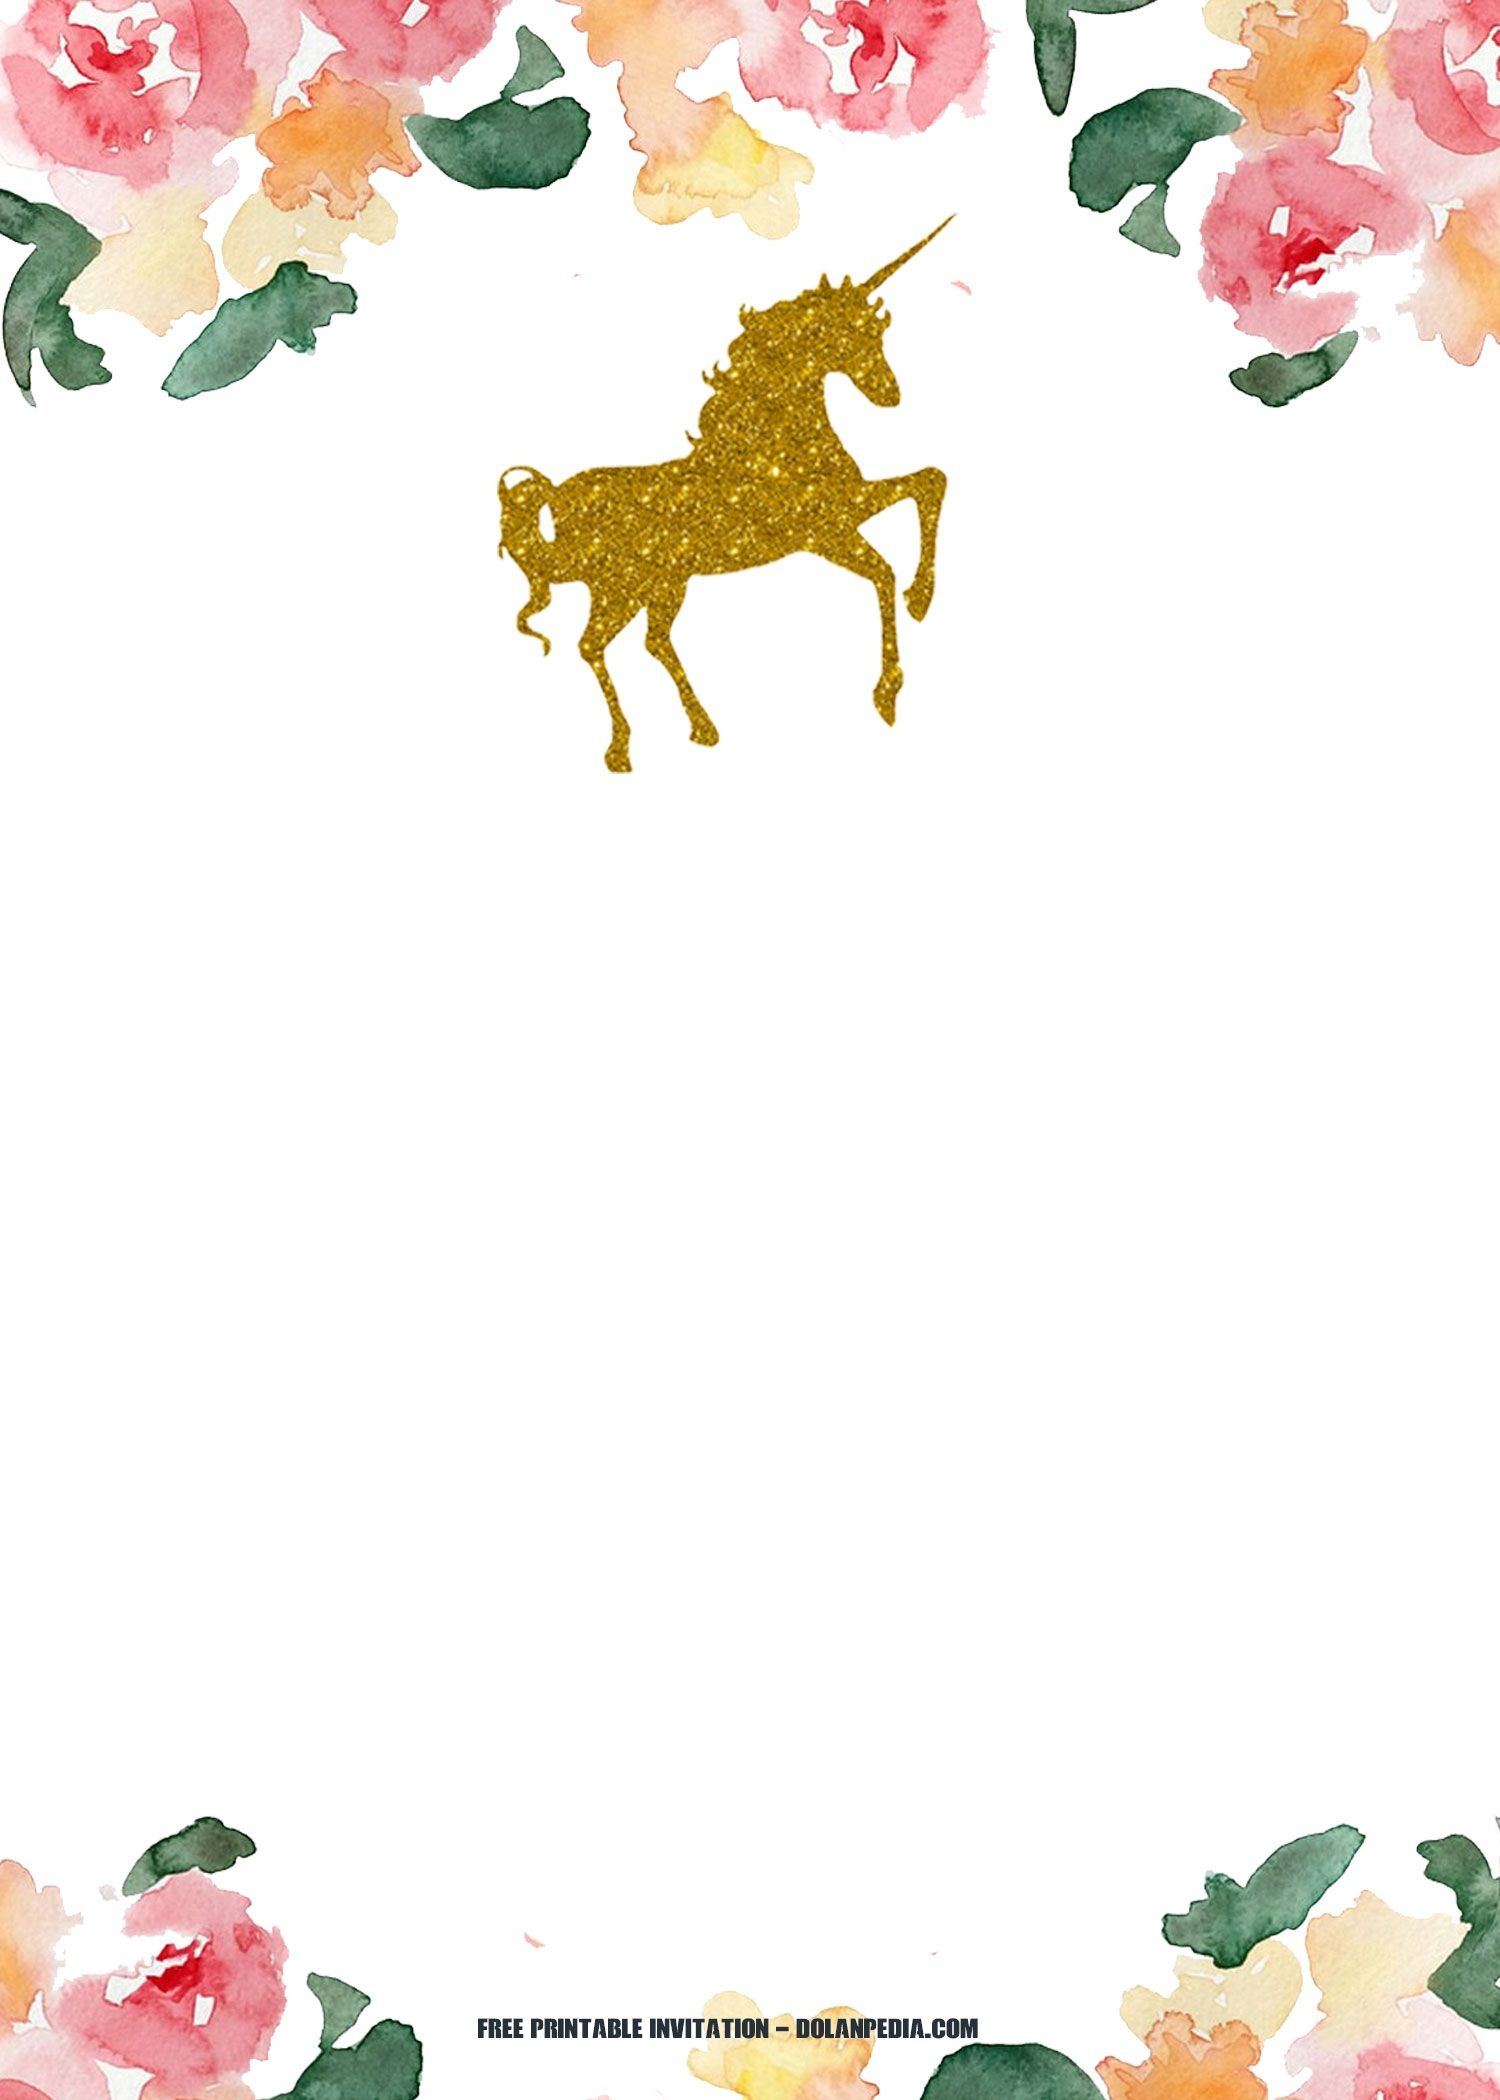 Rainbow Birthday Invitations Beautiful Free Printable Golden Unicorn - Free Printable Unicorn Invitations